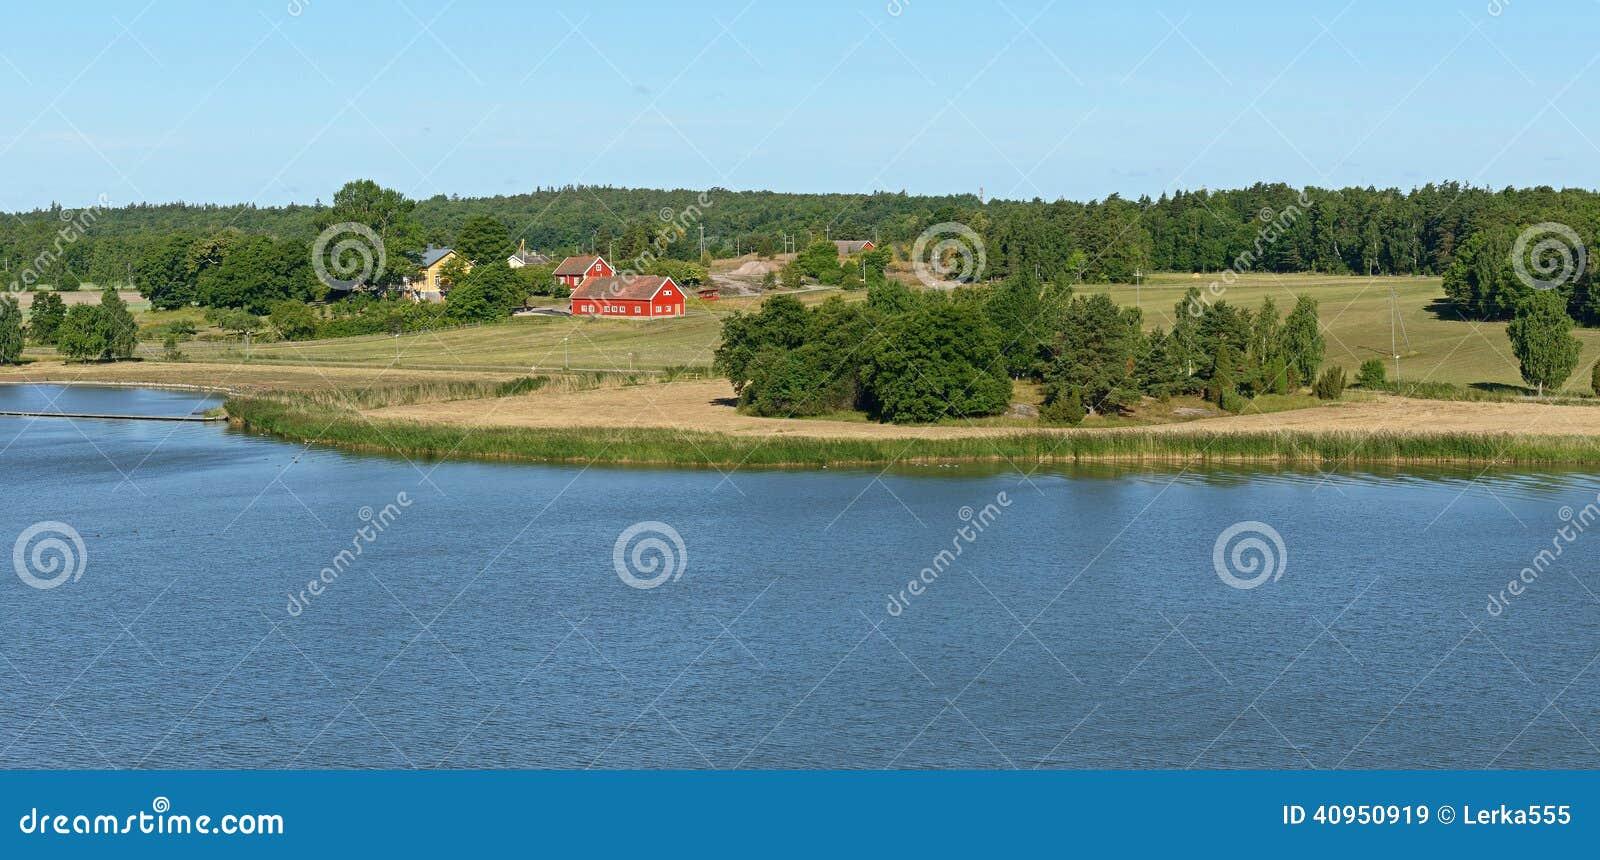 Download Turku Archipelago stock image. Image of nordic, outdoors - 40950919